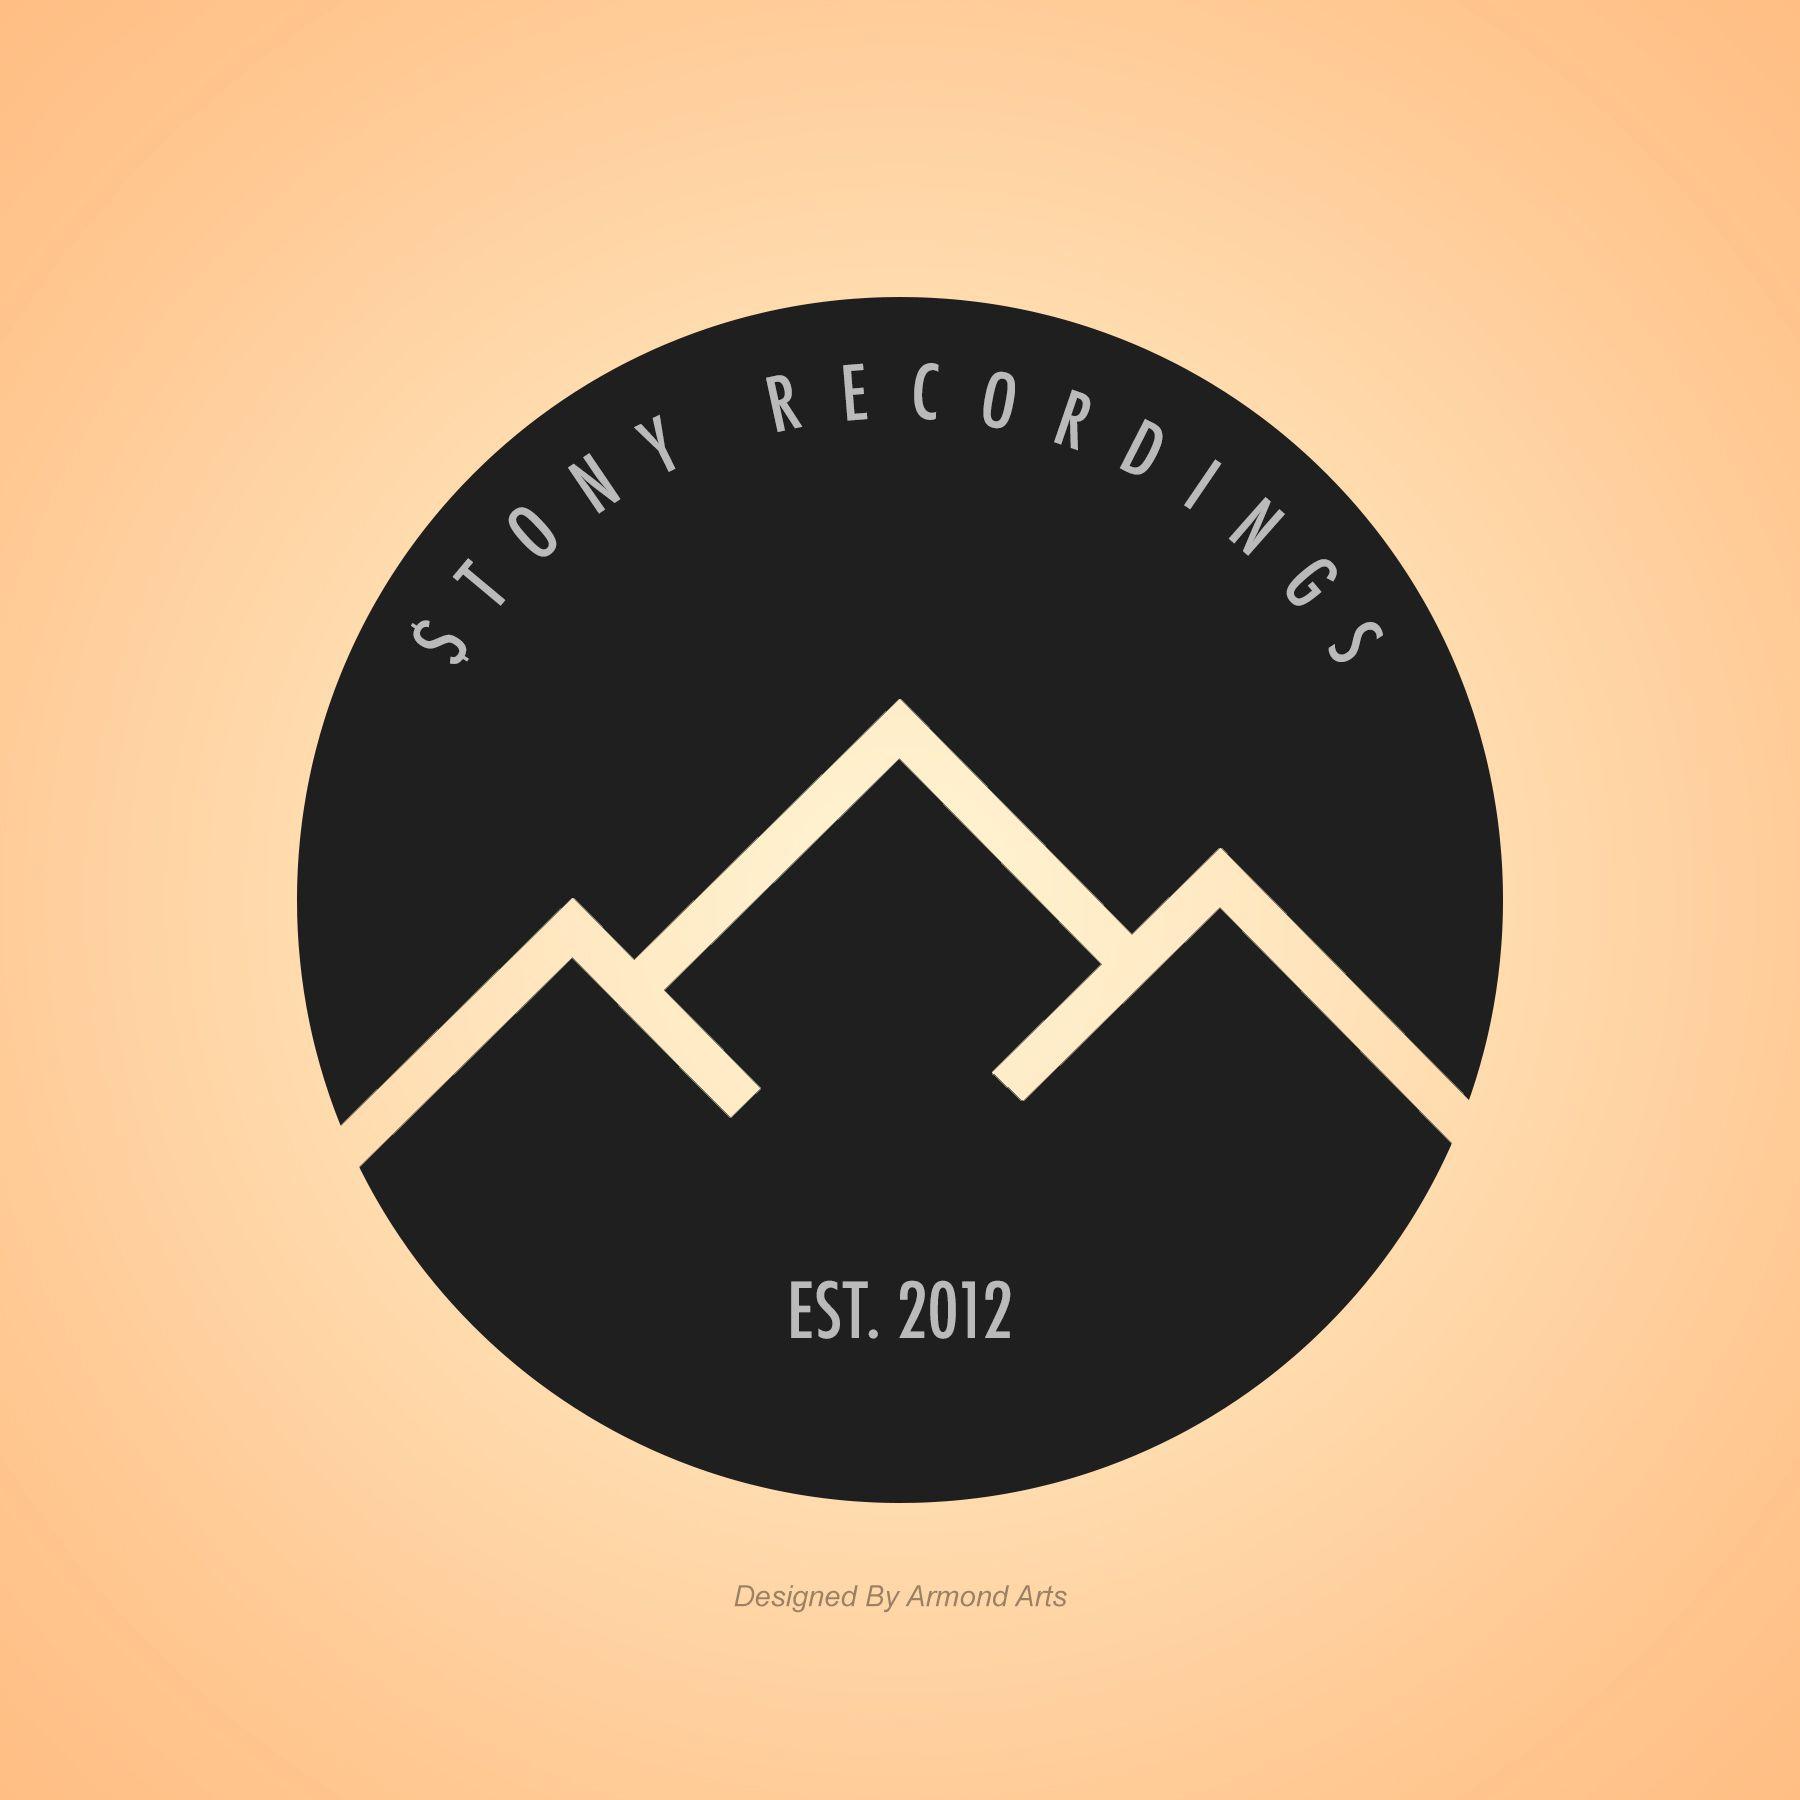 Recording Label based in Kingston, Jamaica. Design, Art